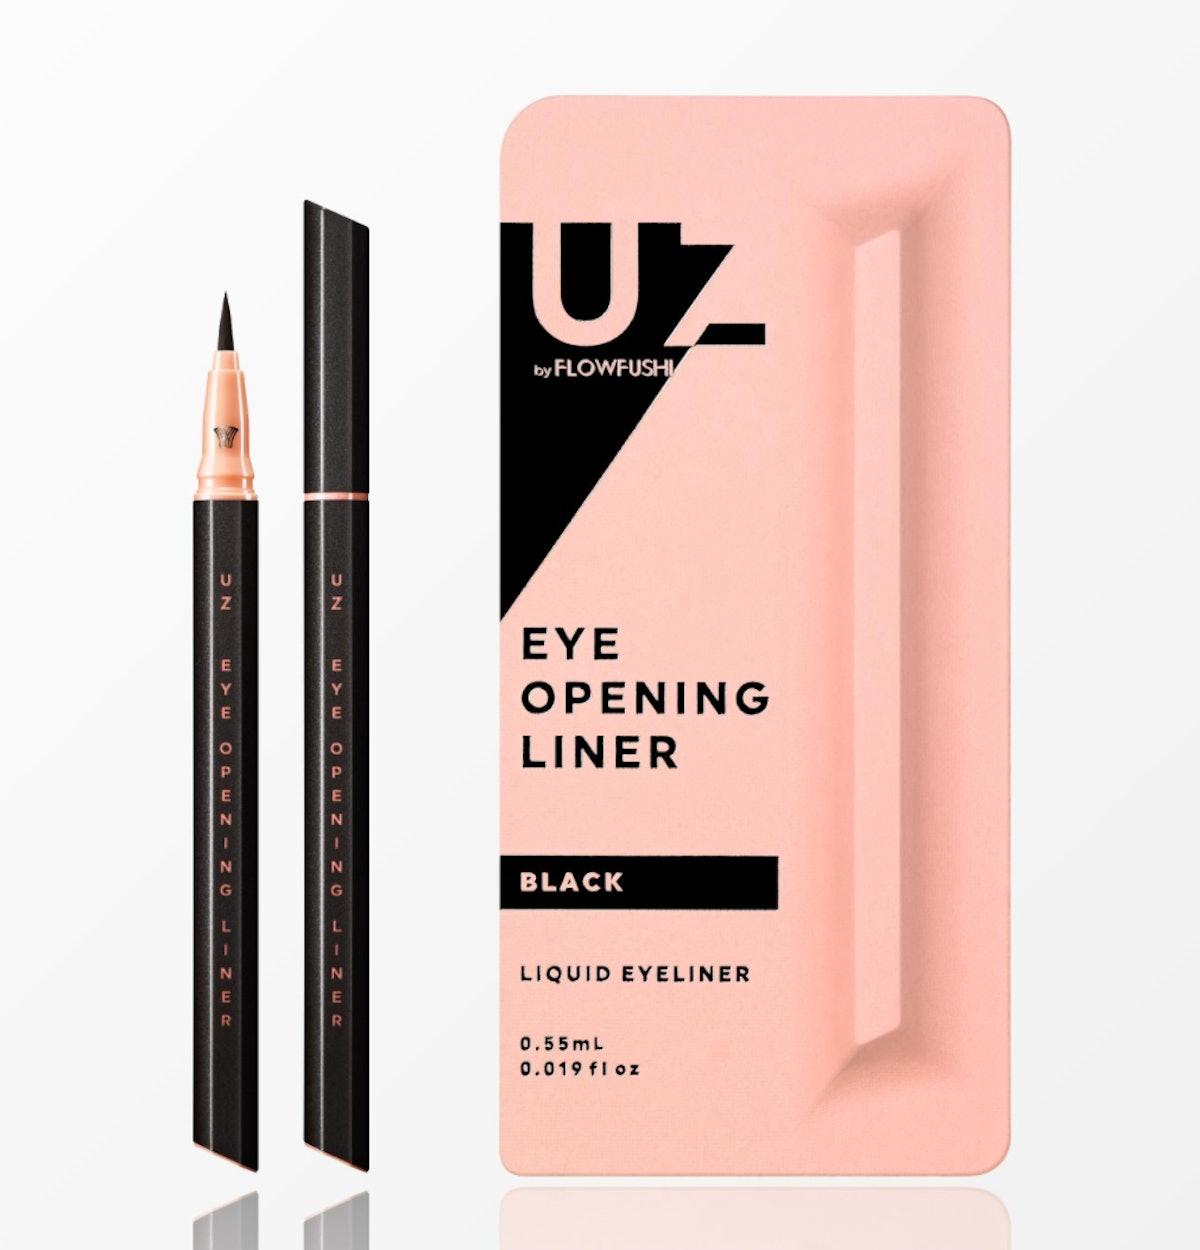 Eye Opening Liner